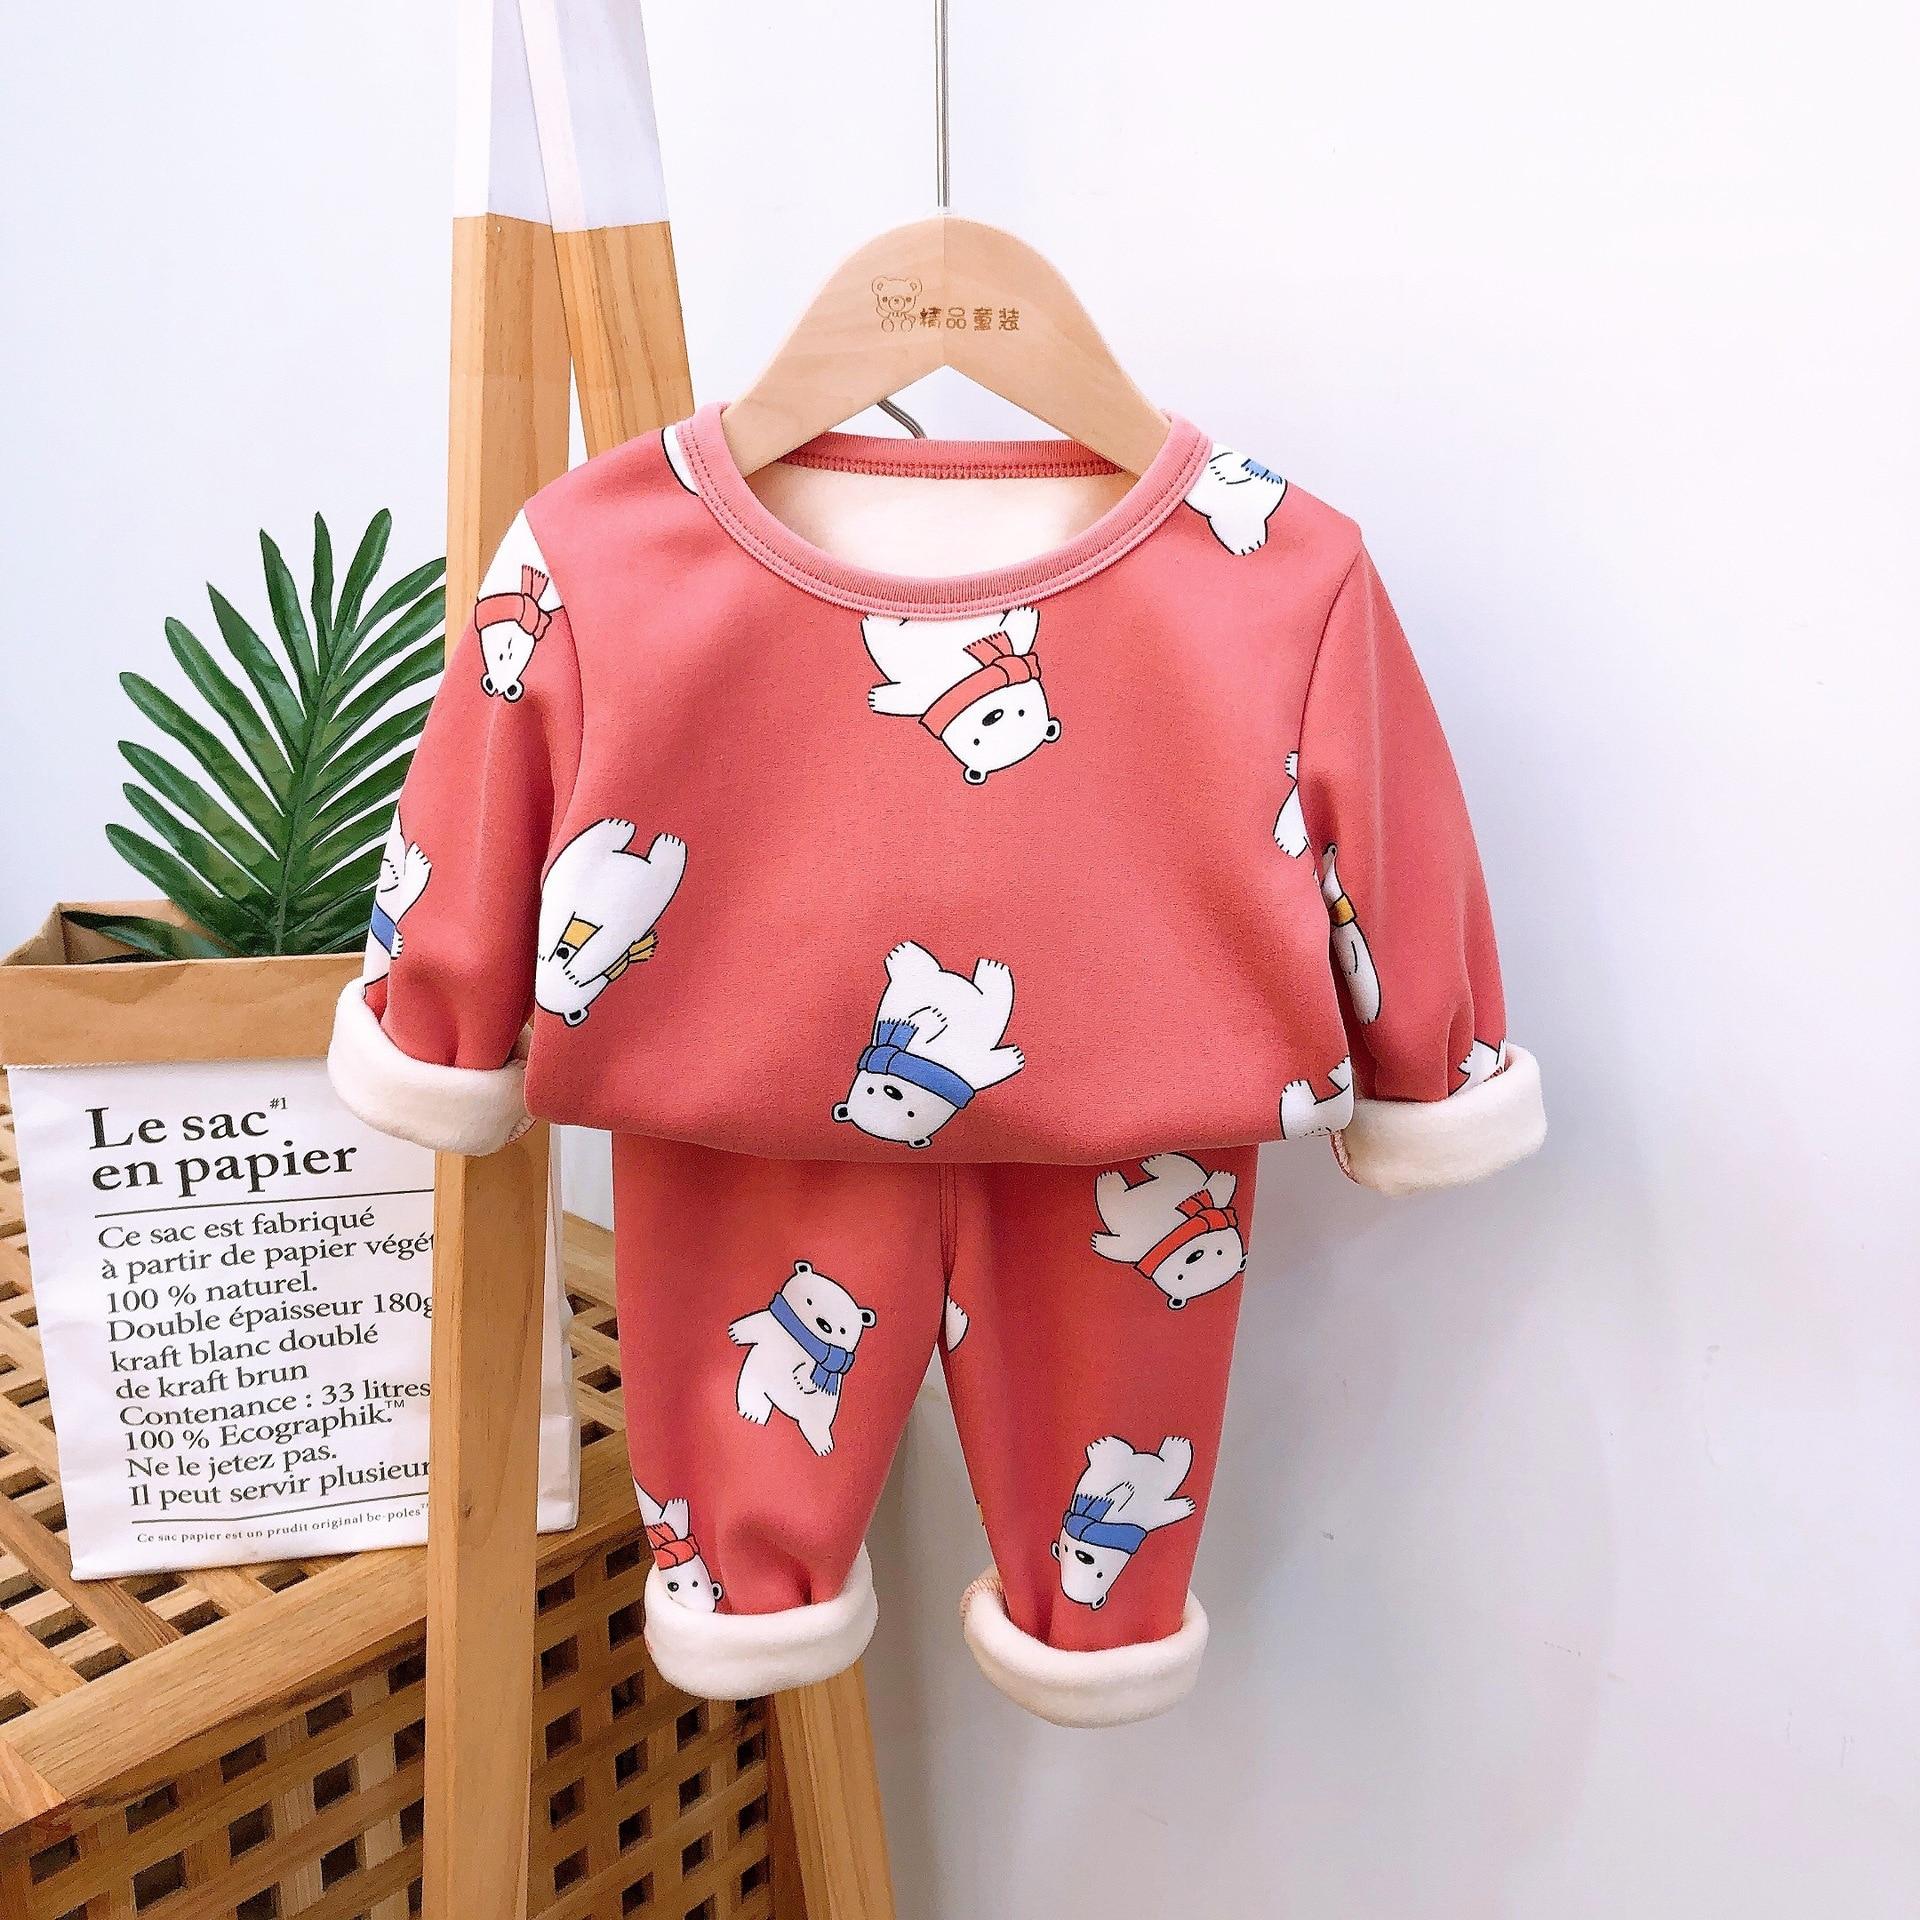 2020 Autumn Winter Thicken Velvet Children Pajamas Cartoon Family Boys Girls Clothing Set Kids Casual Sleepwear Suits Clothes 5